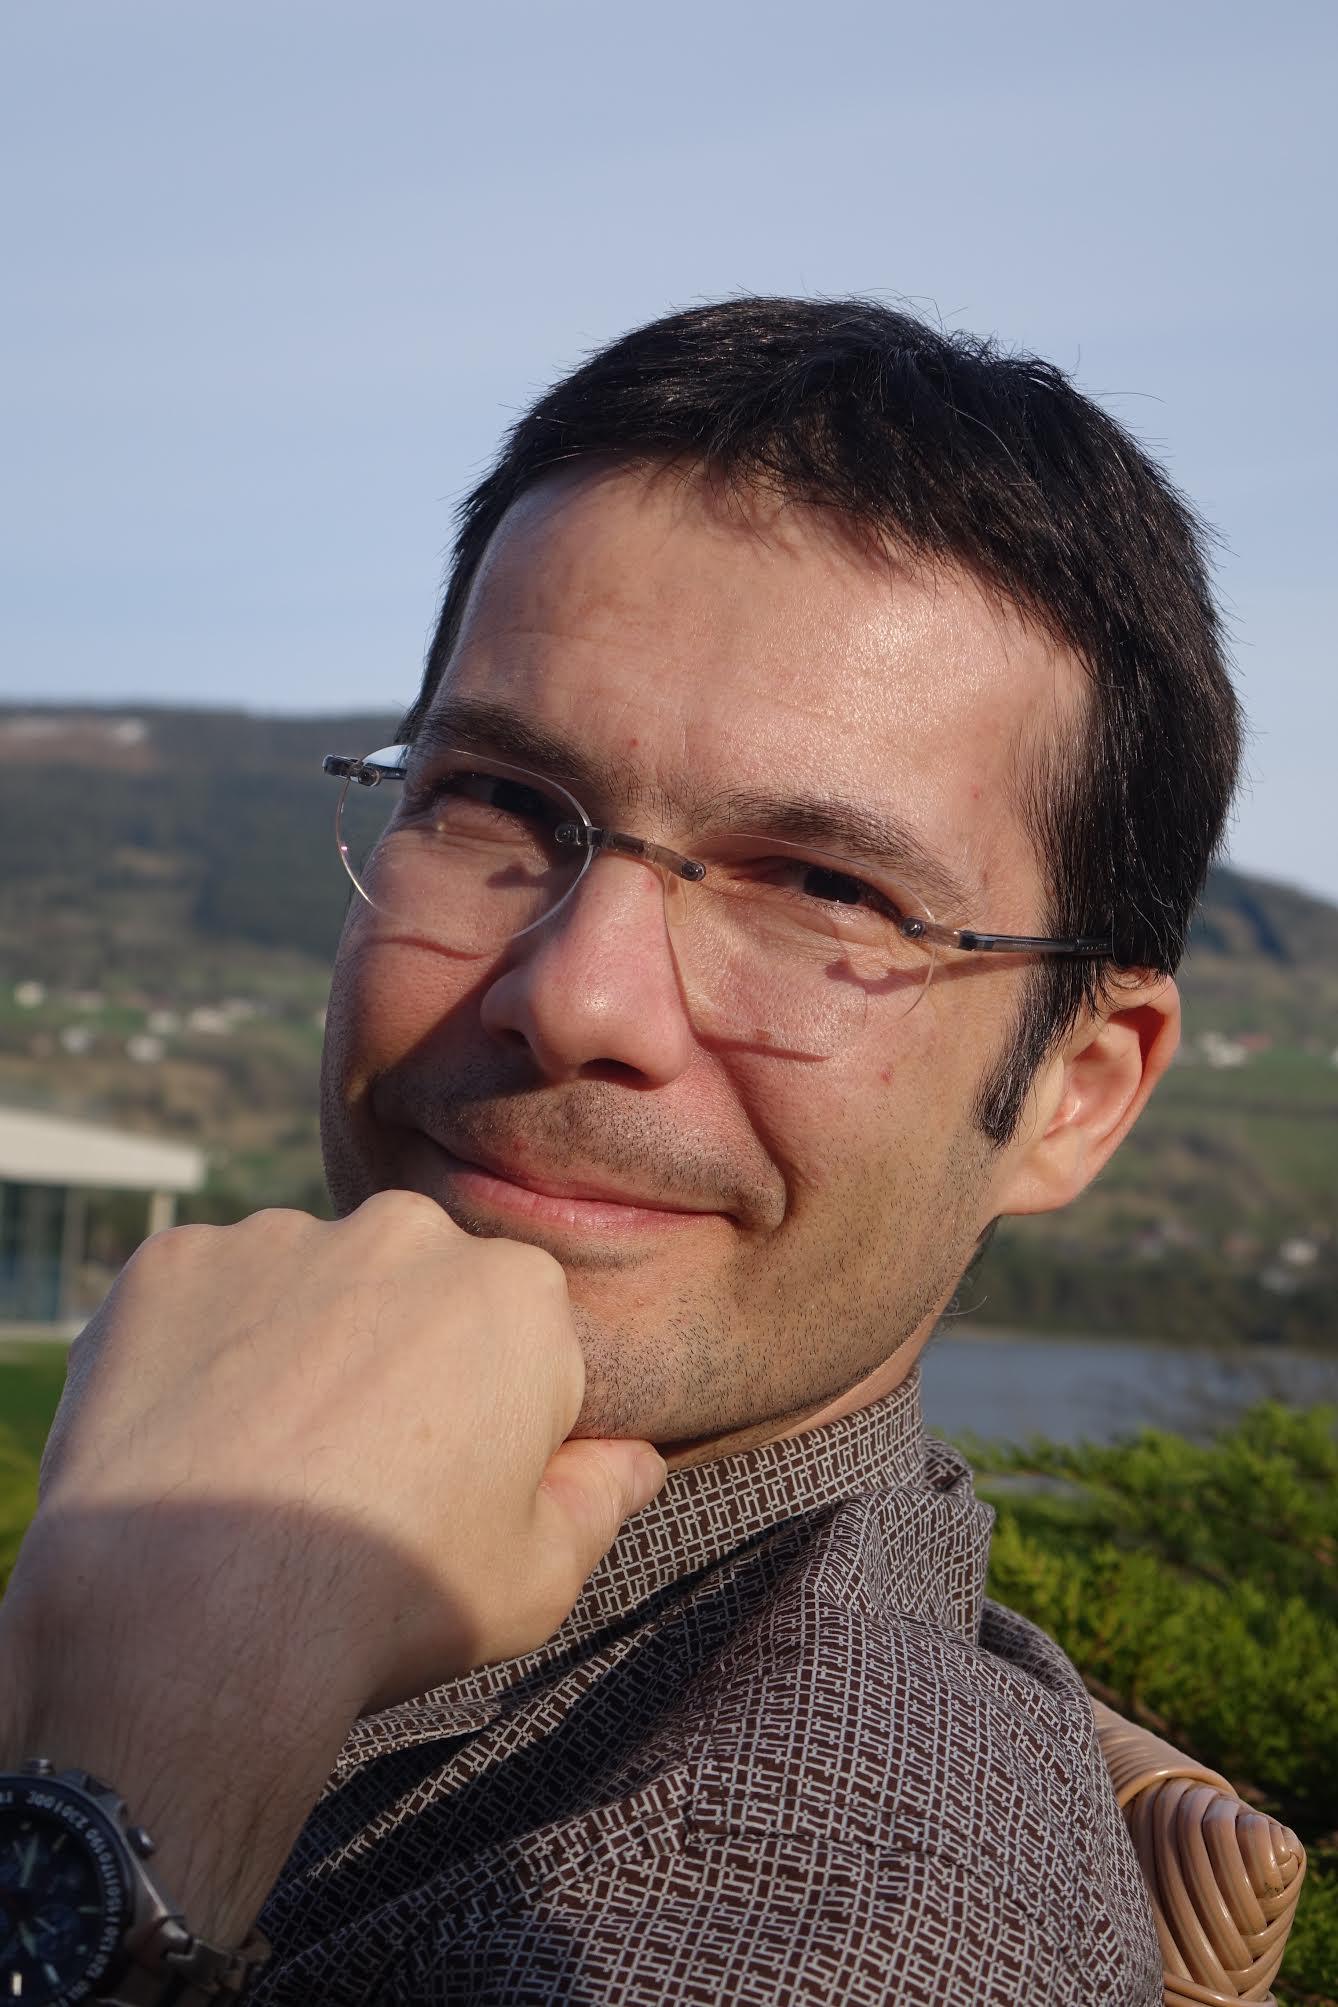 Emmanuel Trélat racconta la sua carriera da matematico